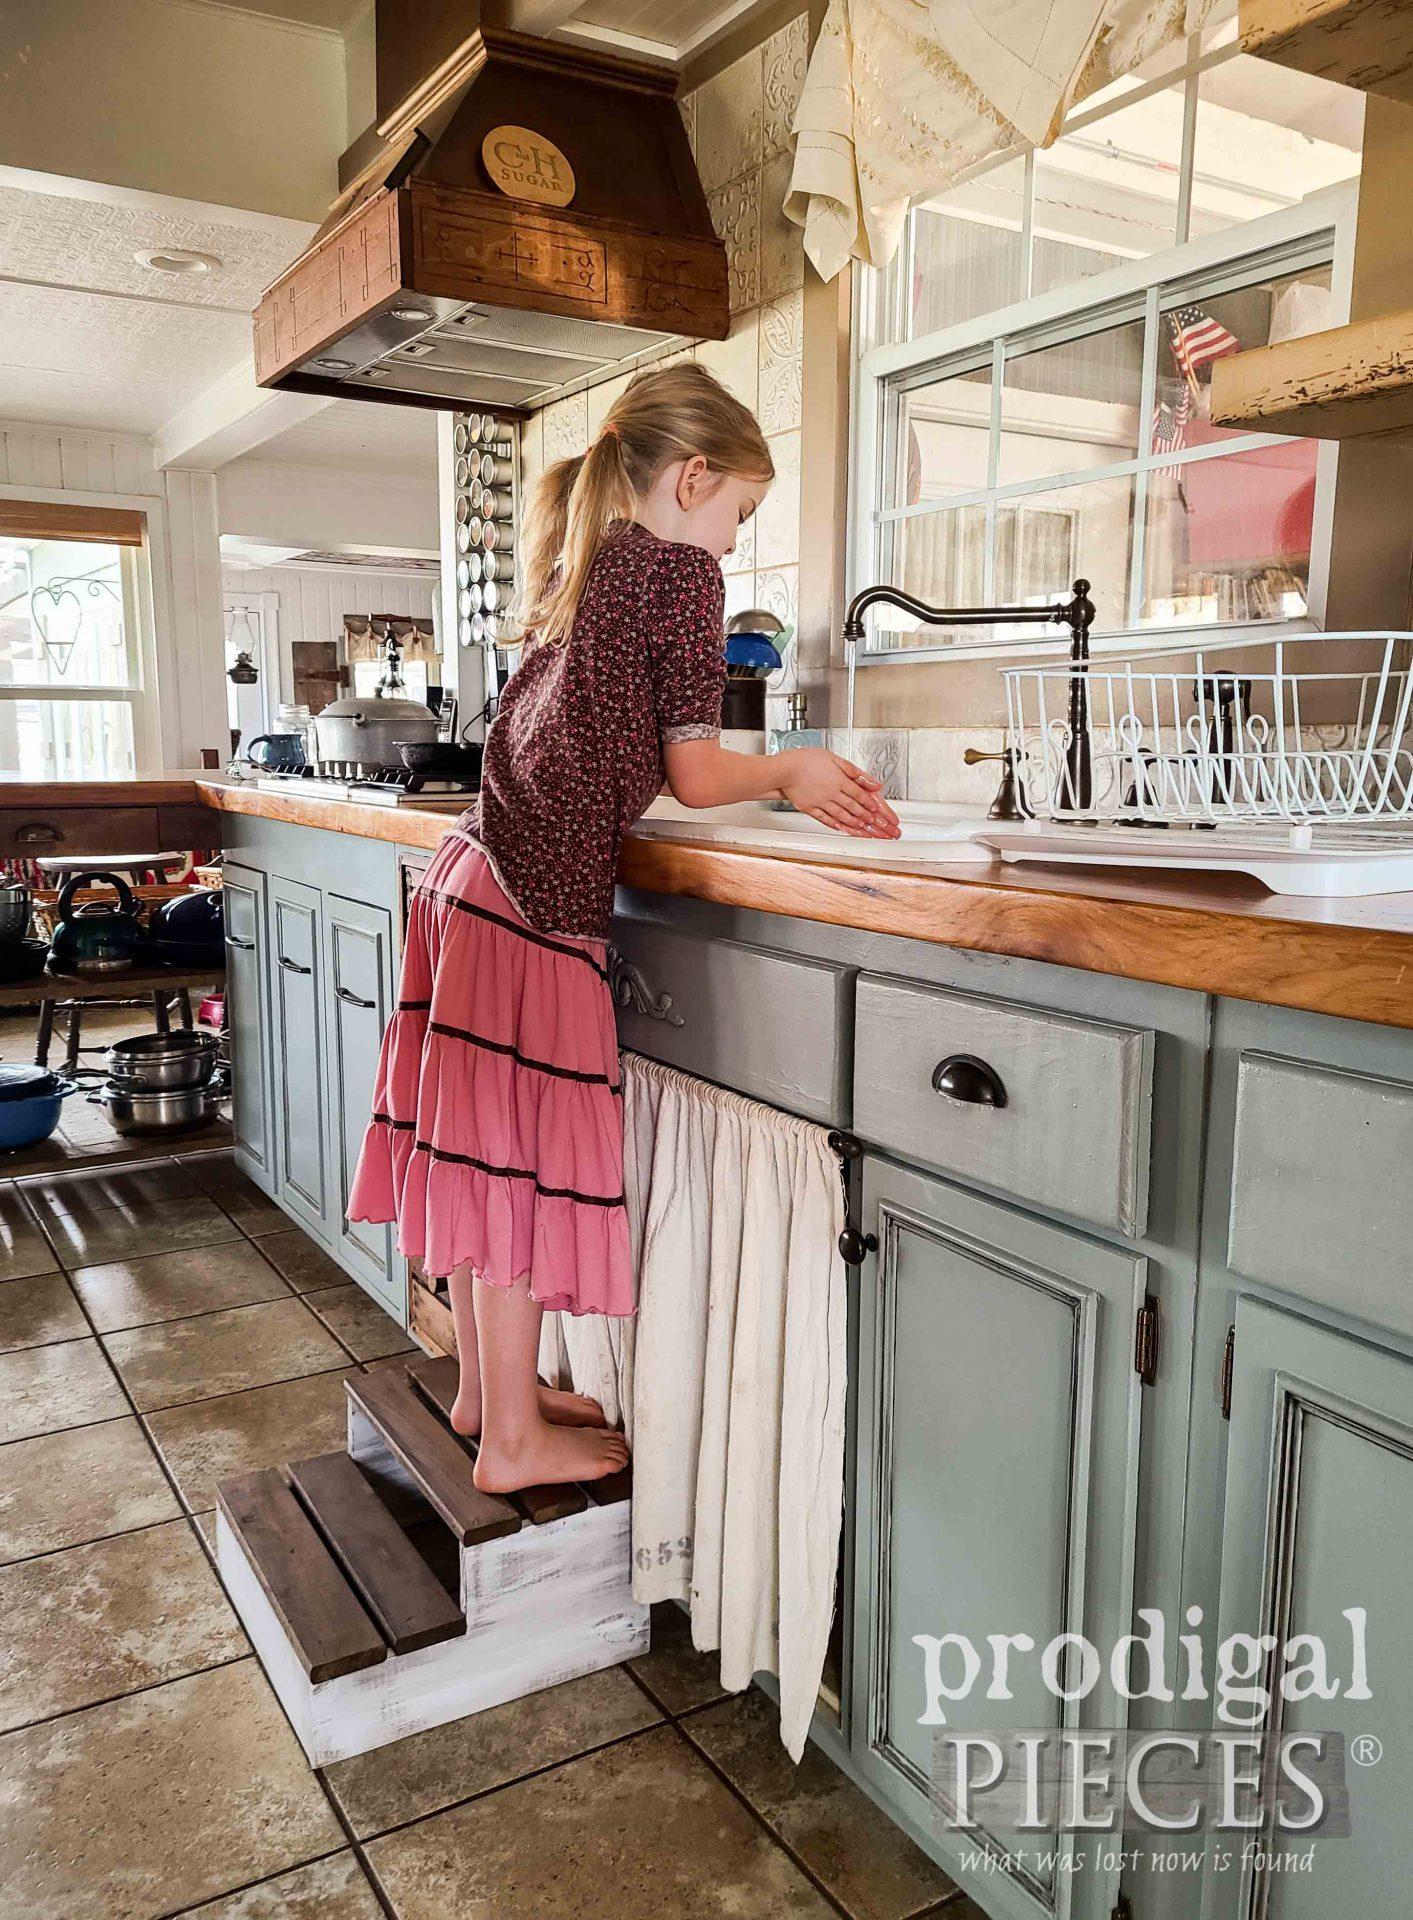 Farmhouse DIY Wood Slat Step Stool Using Scrap Wood by Larissa of Prodigal Pieces | prodigalpieces.com #prodigalpieces #diy #home #woodworking #furniture